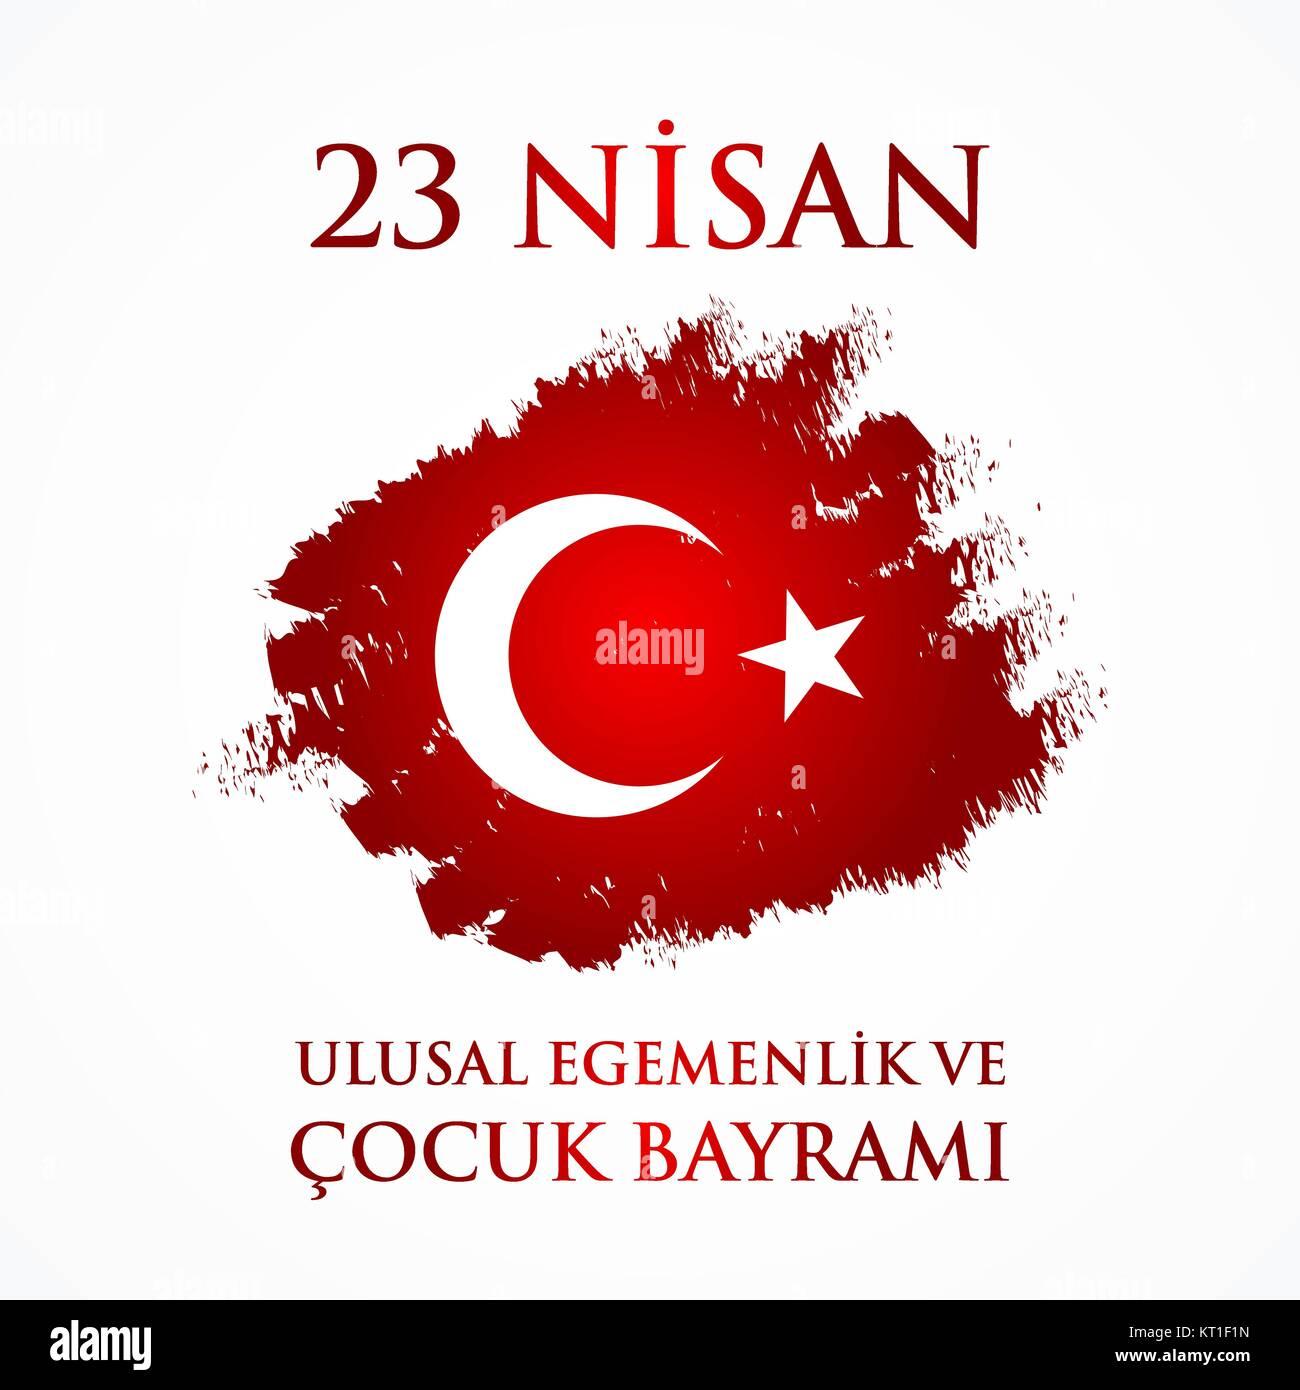 23 nisan uluslar egemenlik ve cocuk baryrami. Translation: Turkish April 23 National Sovereignty and Children's - Stock Image